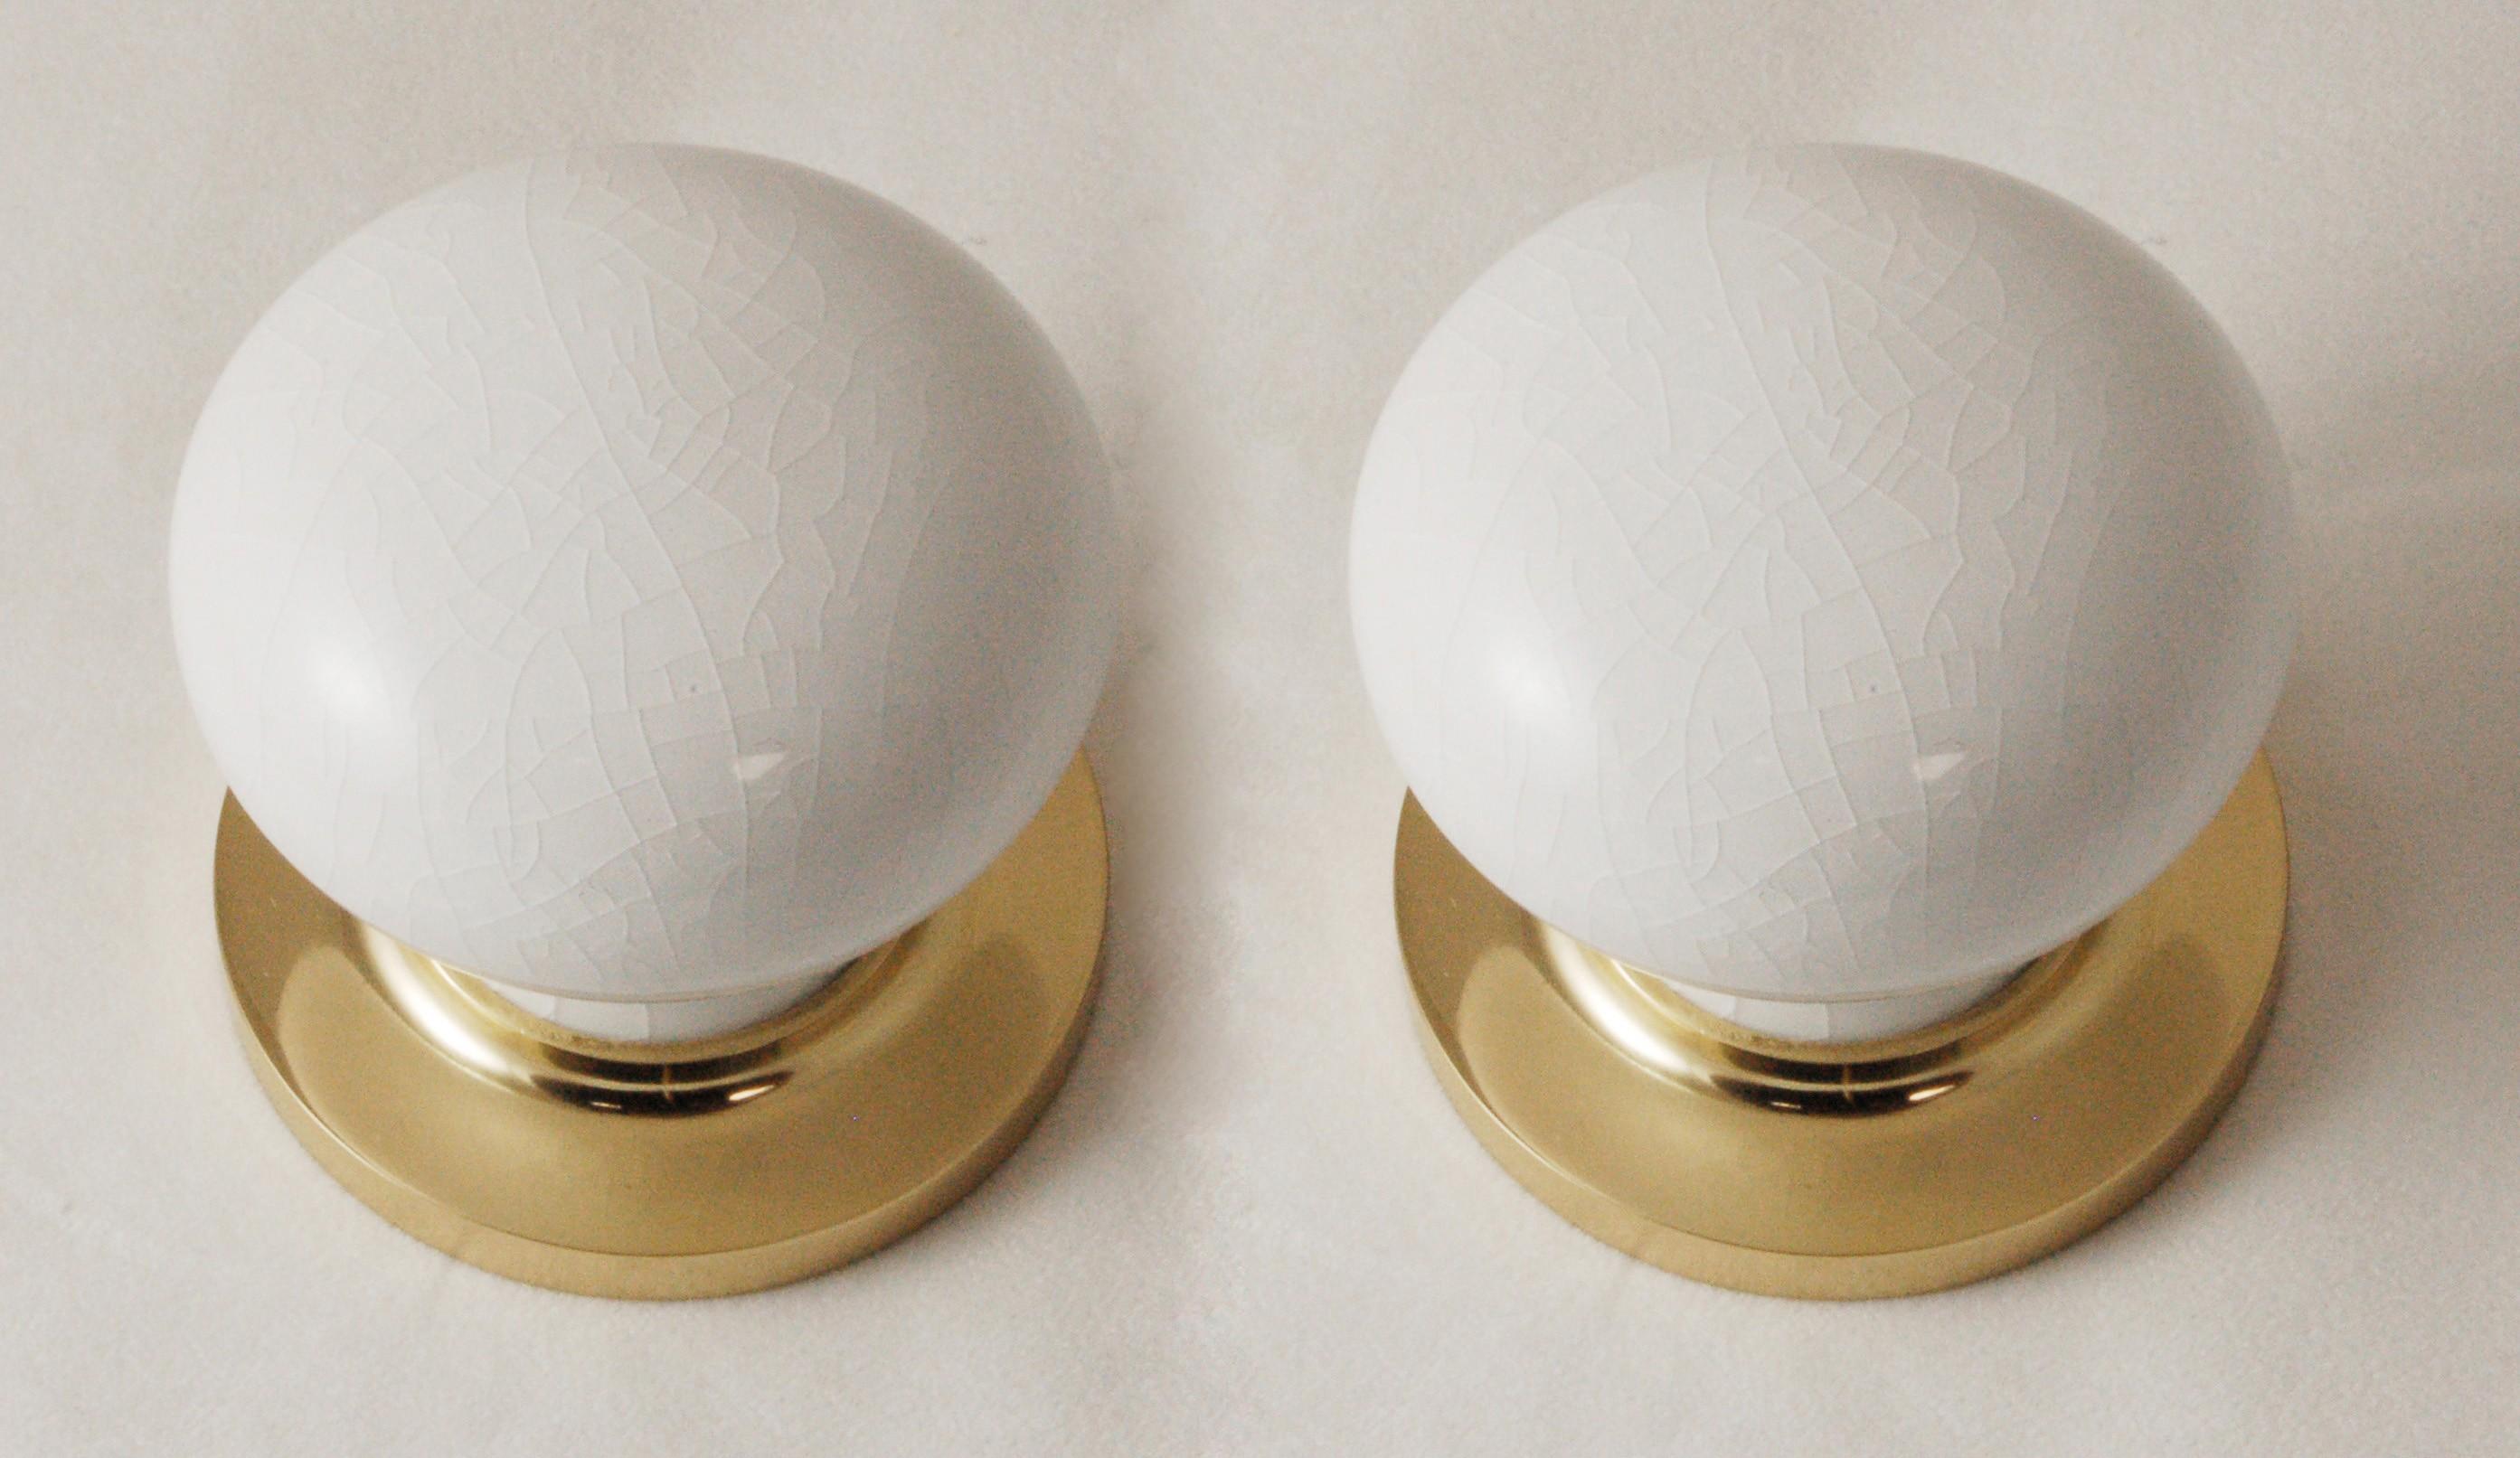 white porcelain door knobs photo - 16